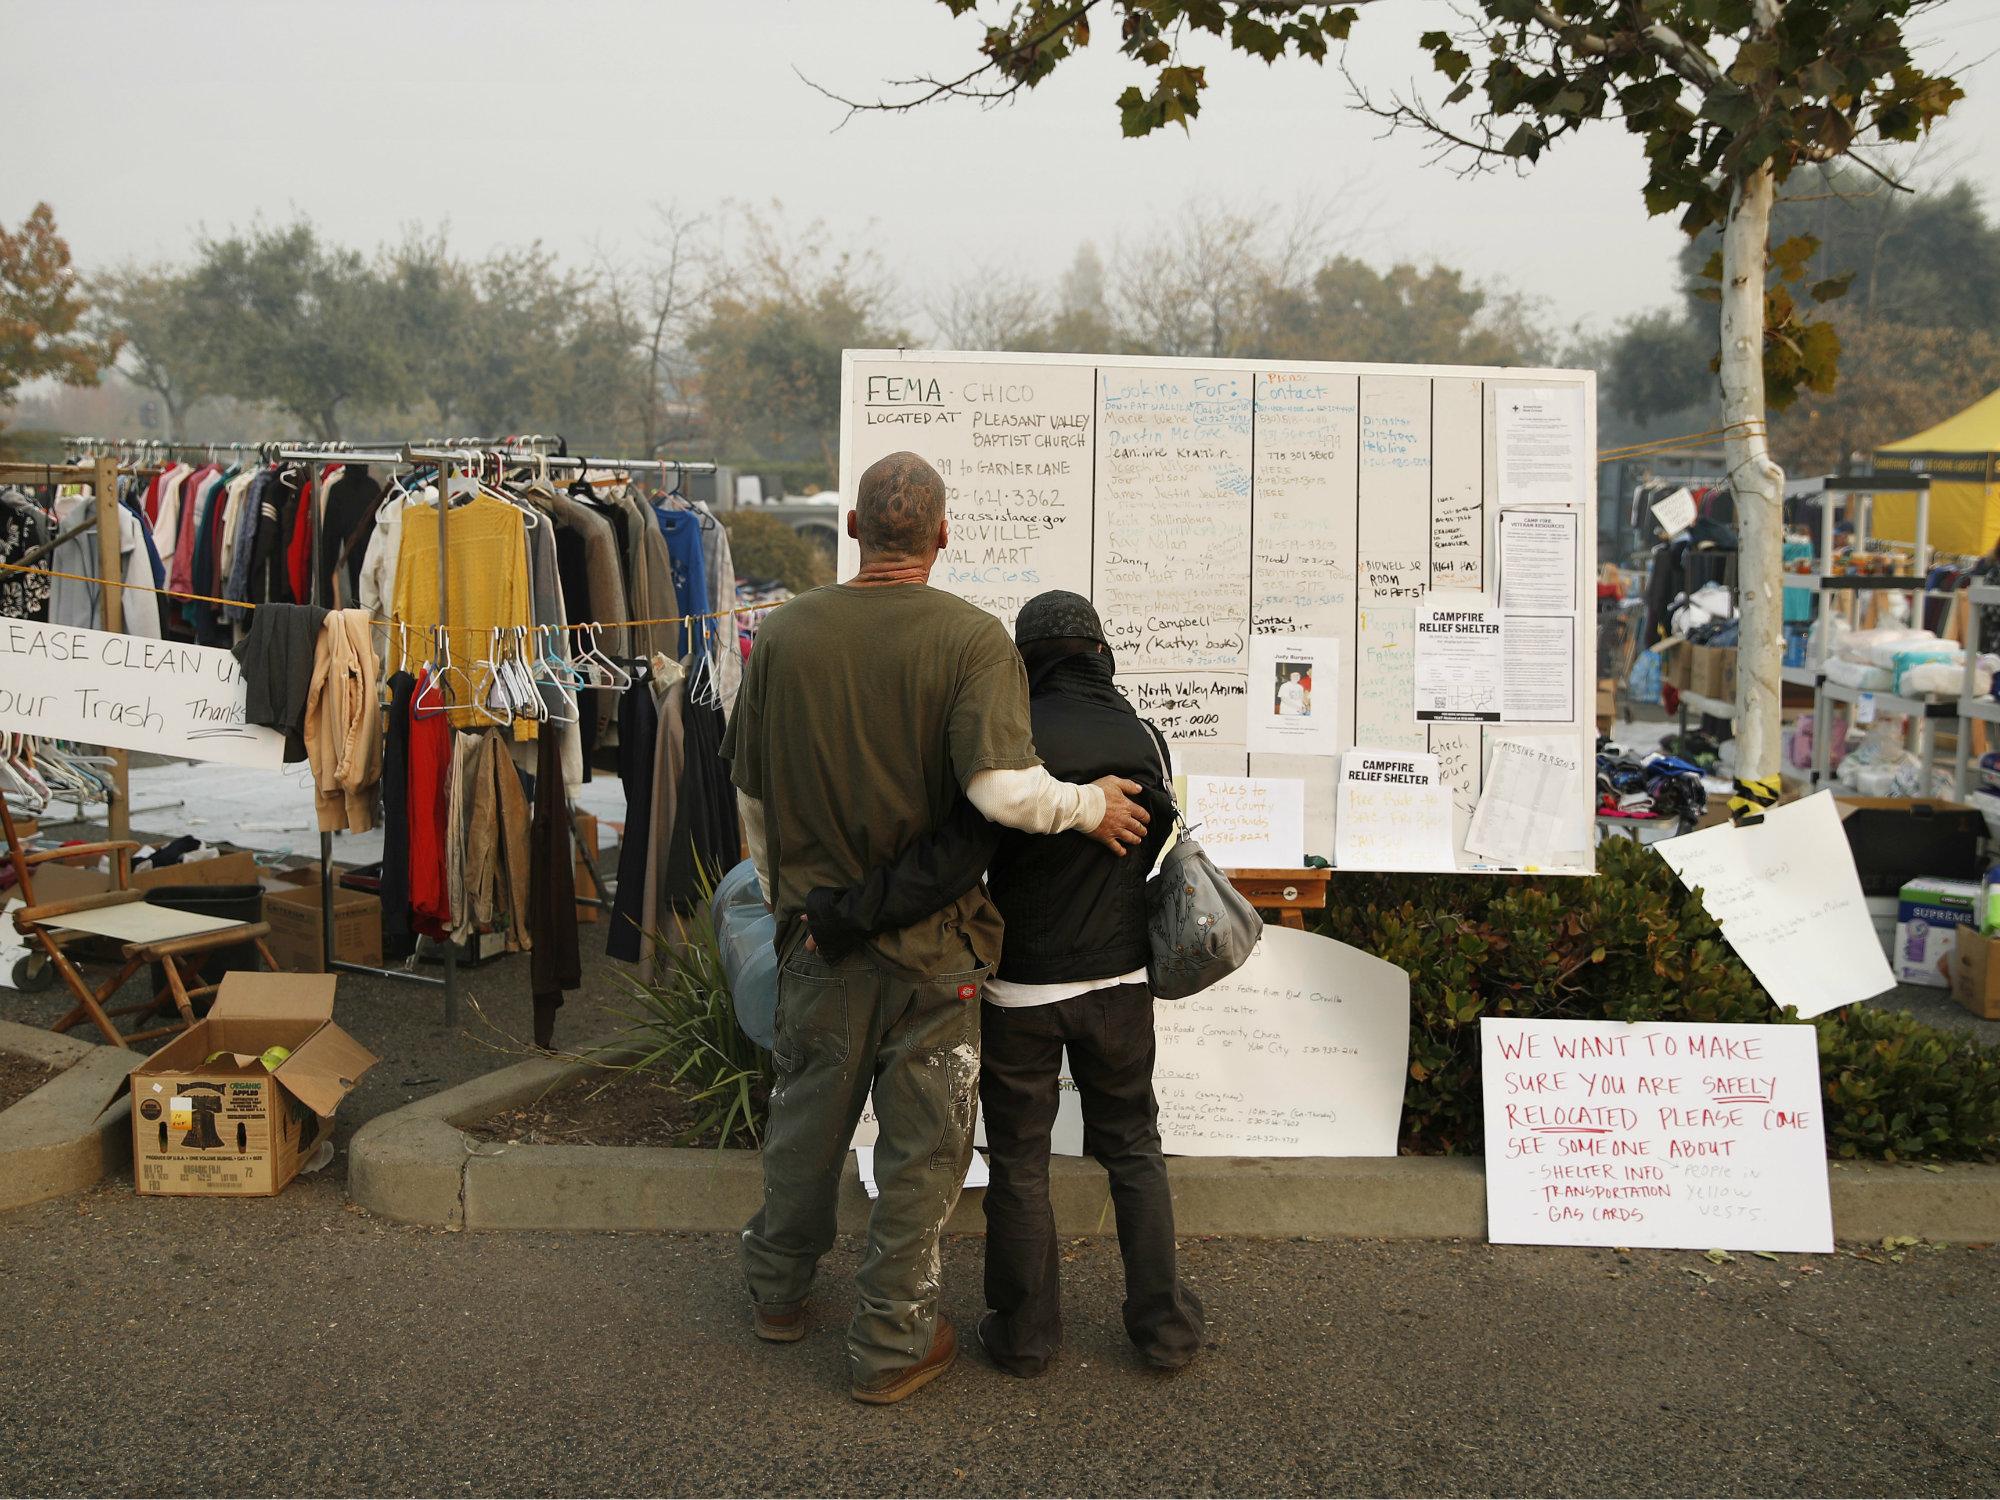 fd4d8e57 Insight: Camp Fire Update / Camp Fire Victim Aid / Political Junkie /  Cities You Wish You Were From - capradio.org